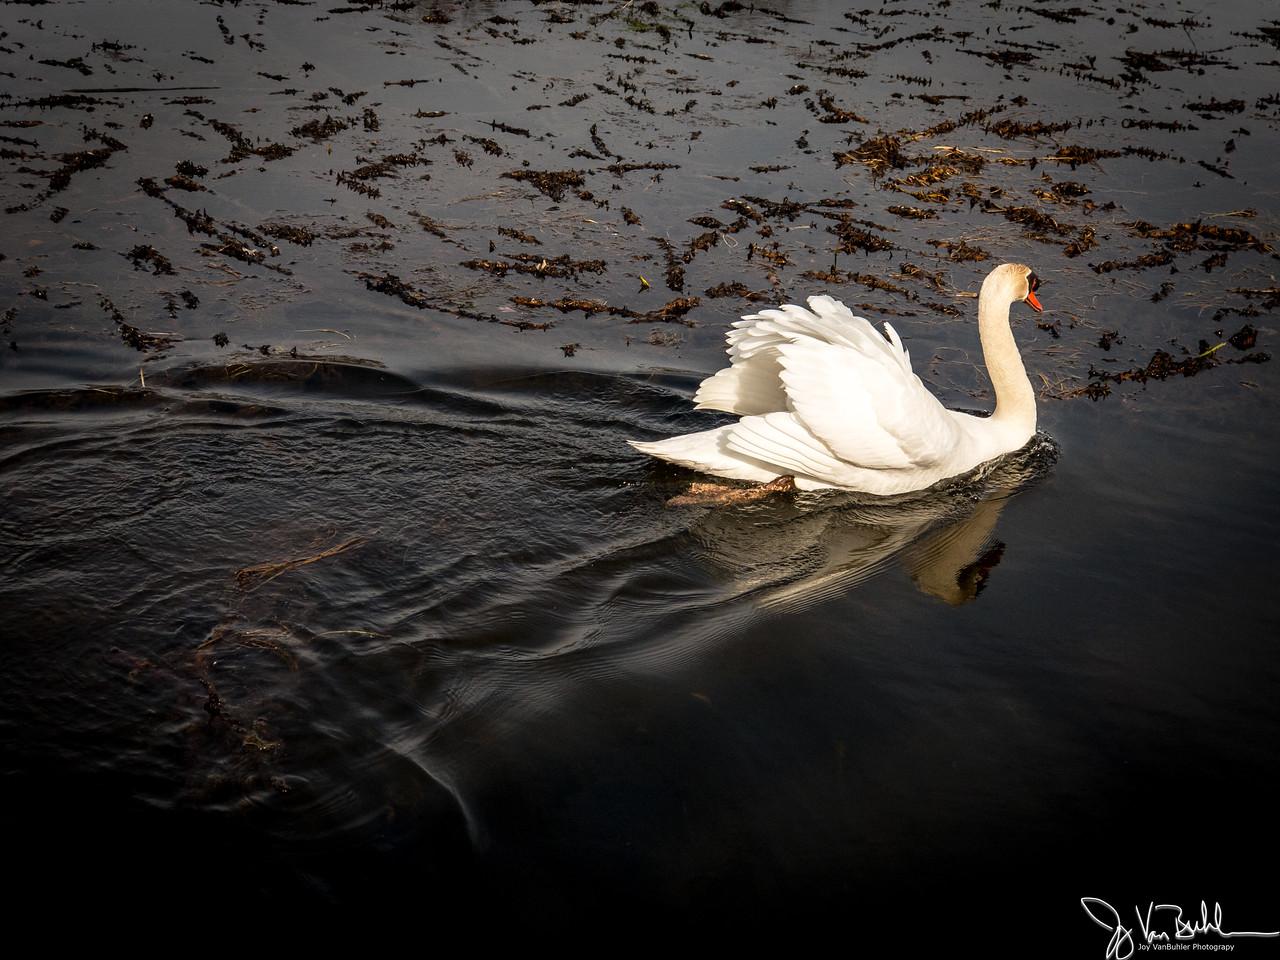 99/365 - Swans